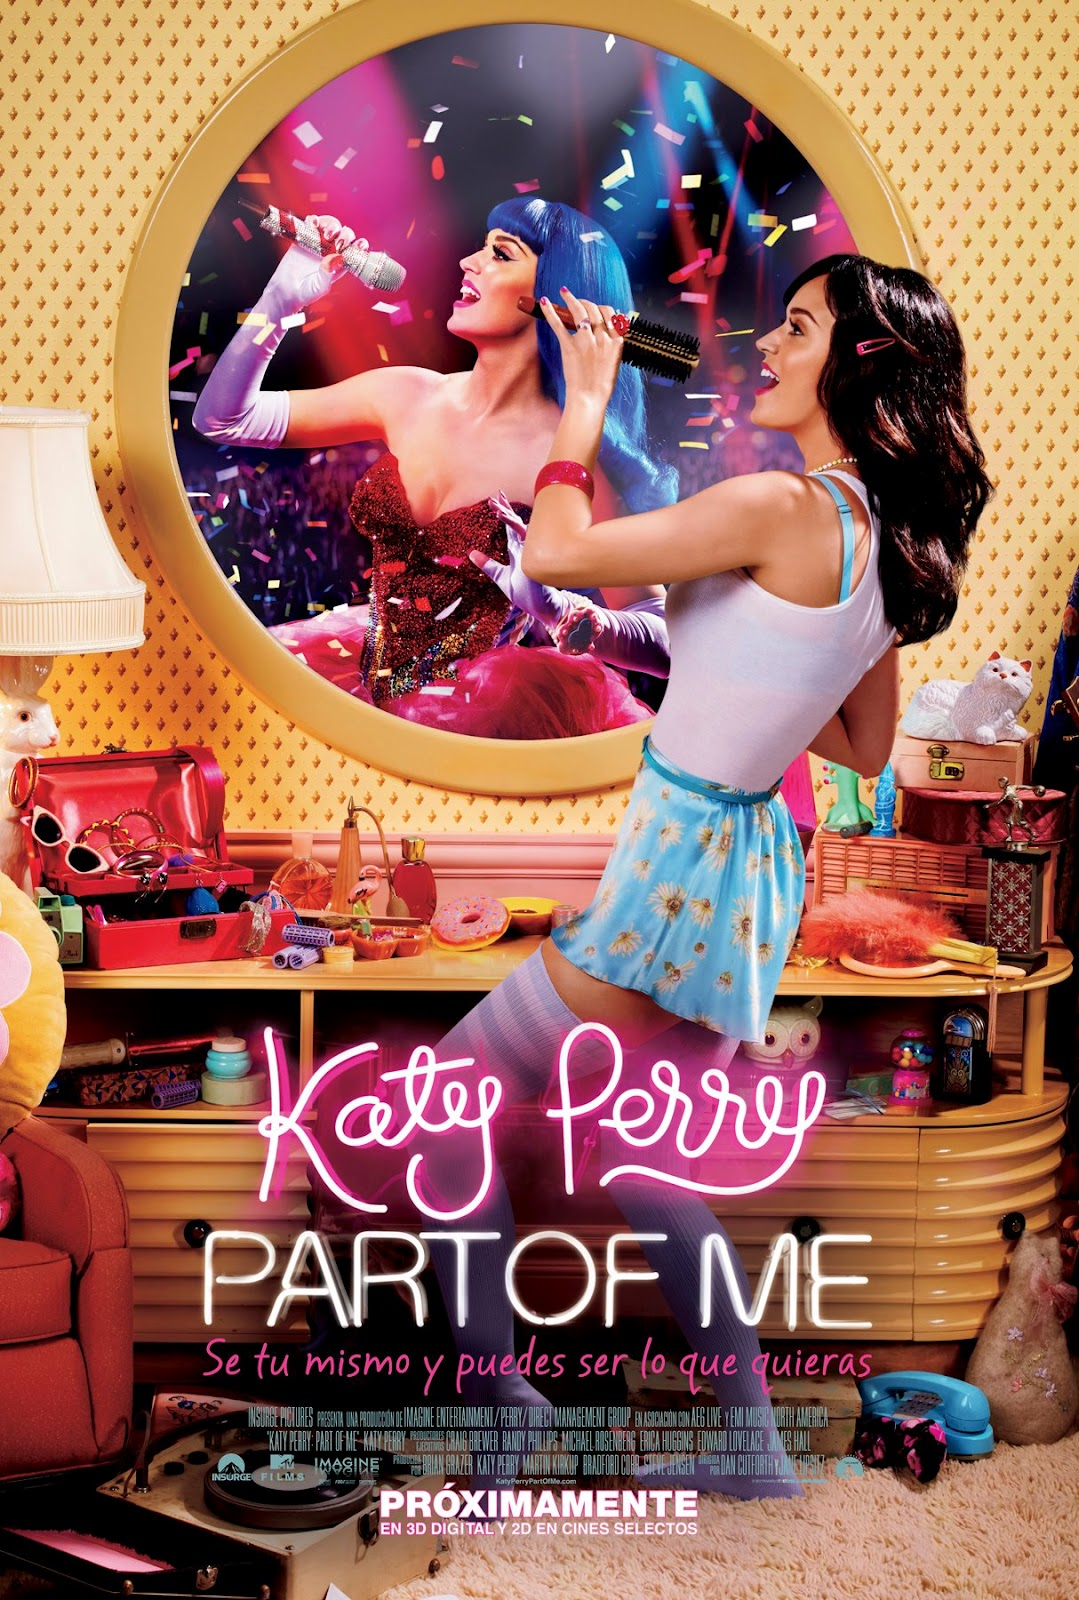 http://1.bp.blogspot.com/-4L-J6u64U4E/UC7SoBUC9ZI/AAAAAAAABOg/puTBTLuECKQ/s1600/Katy+Perry+Part+of+Me+poster.jpg